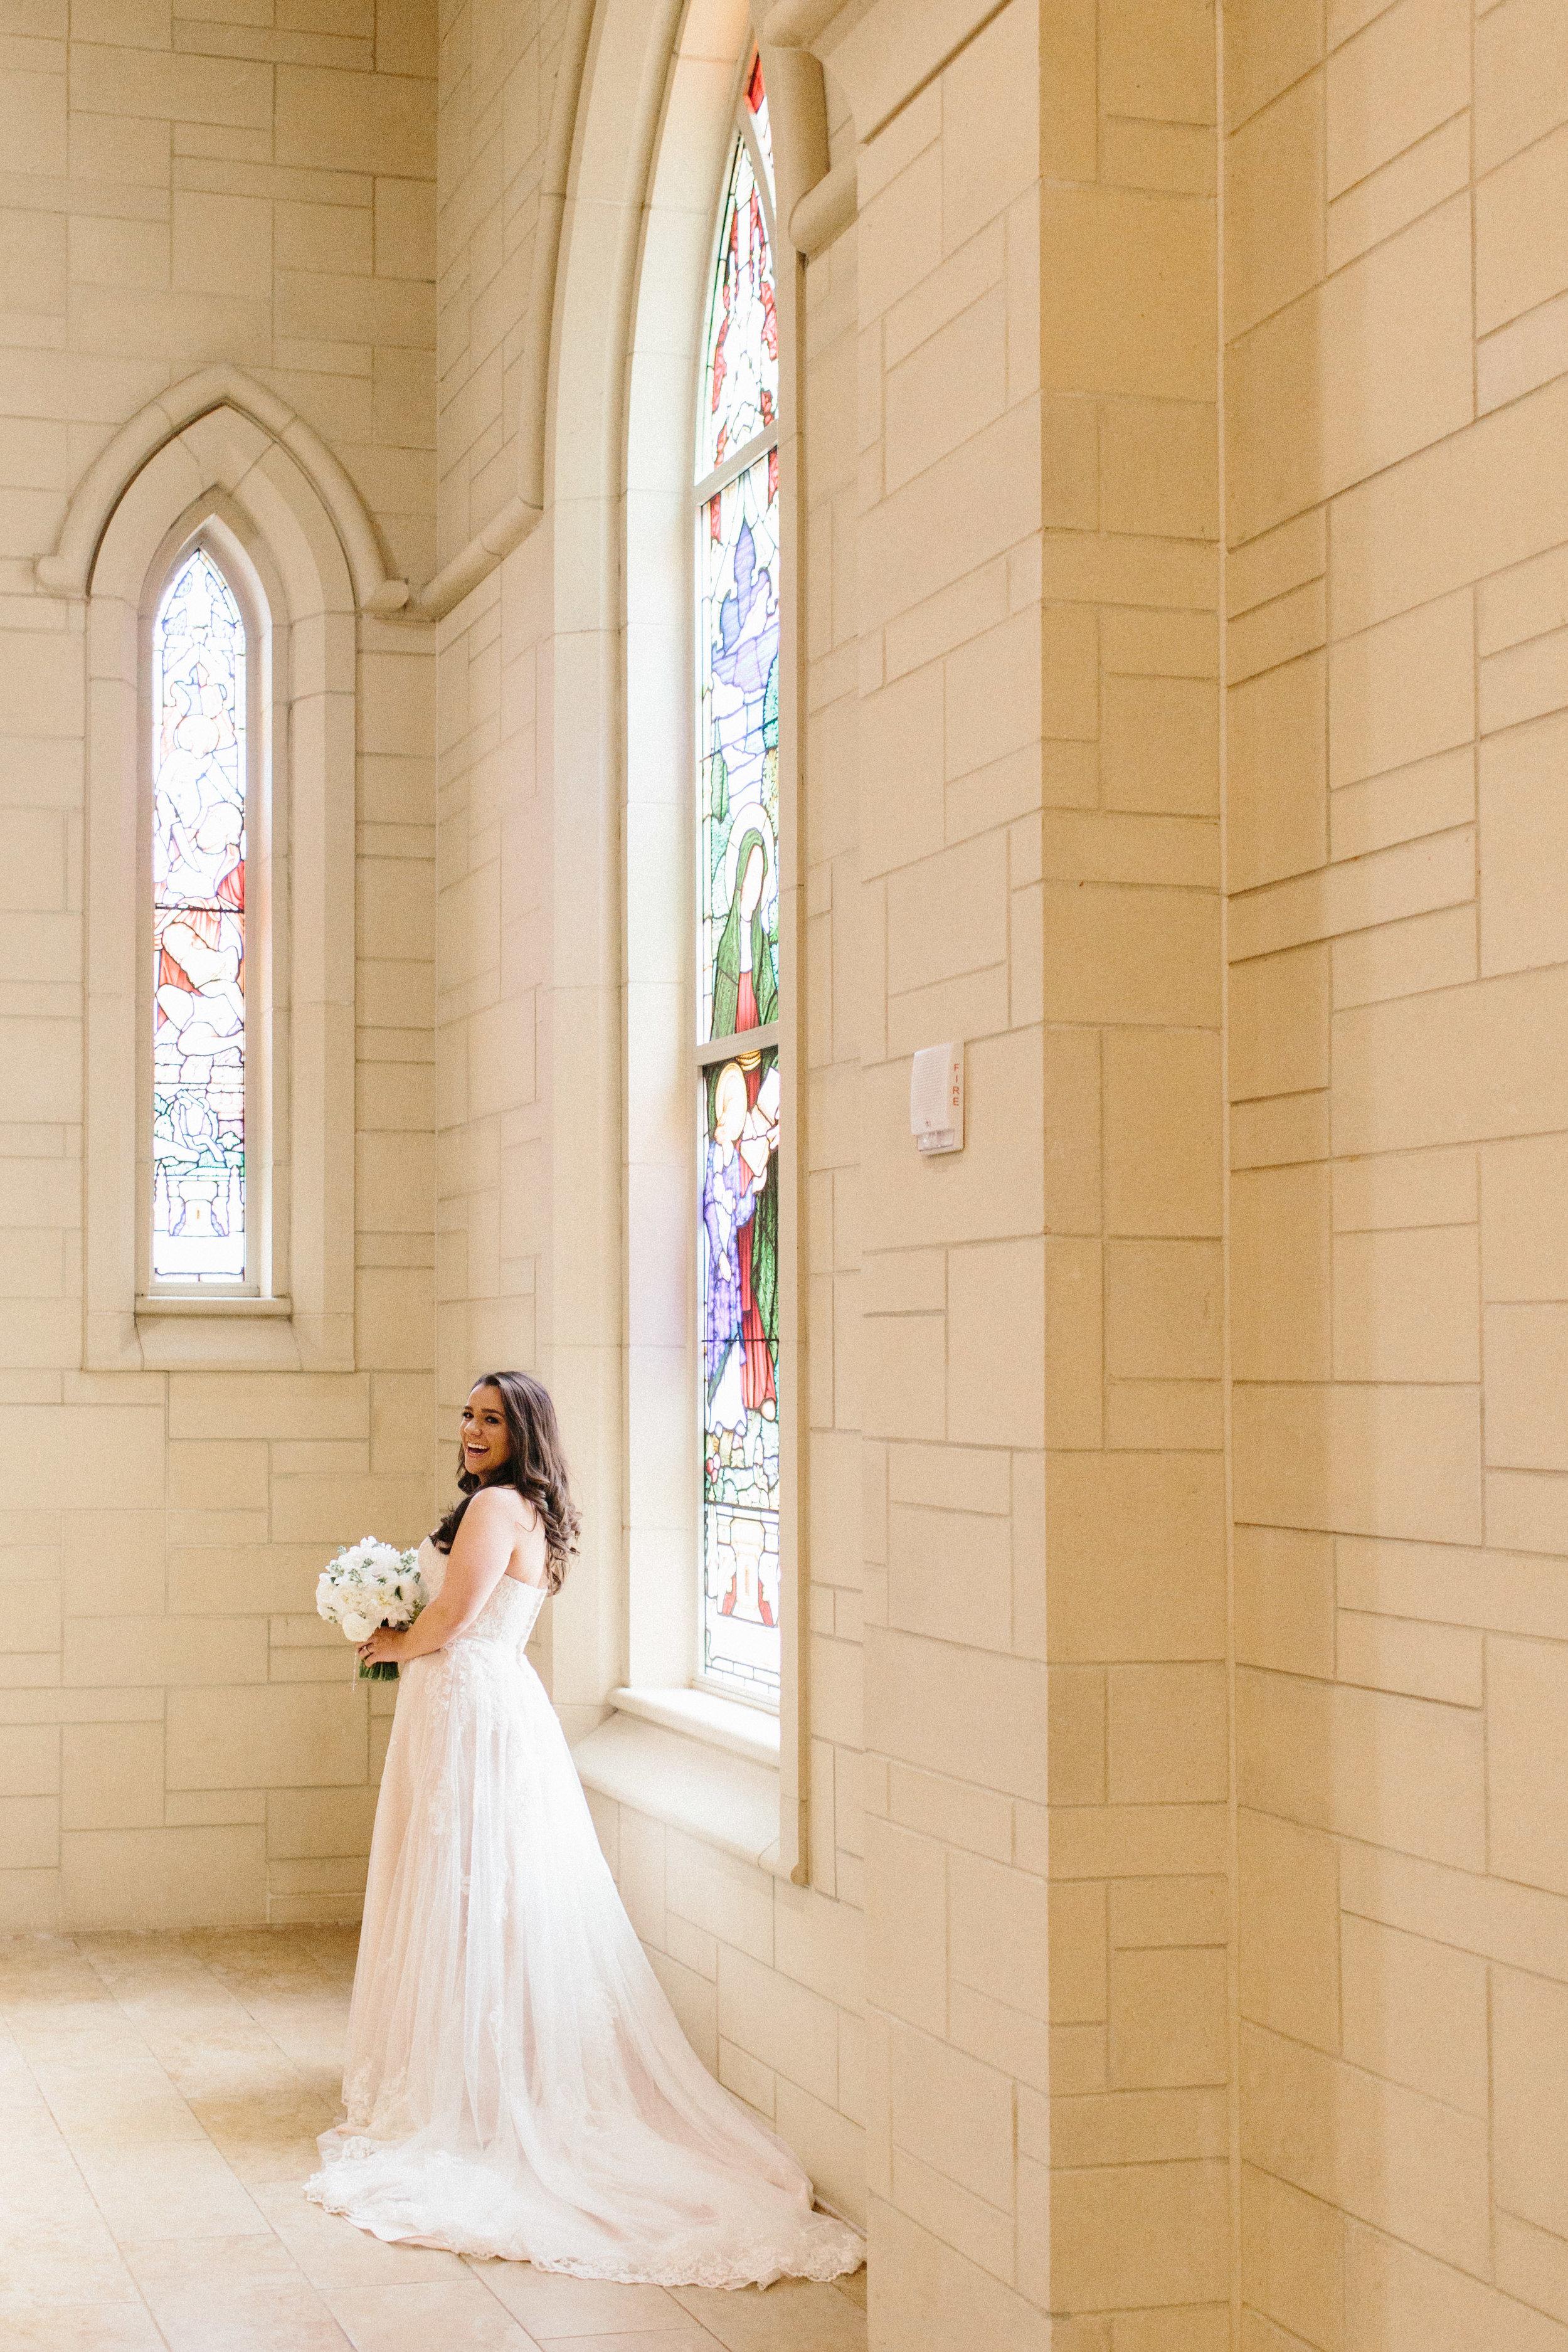 roswell_st_peter_chanel_catholic_avalon_hotel_alpharetta_wedding-1215.jpg